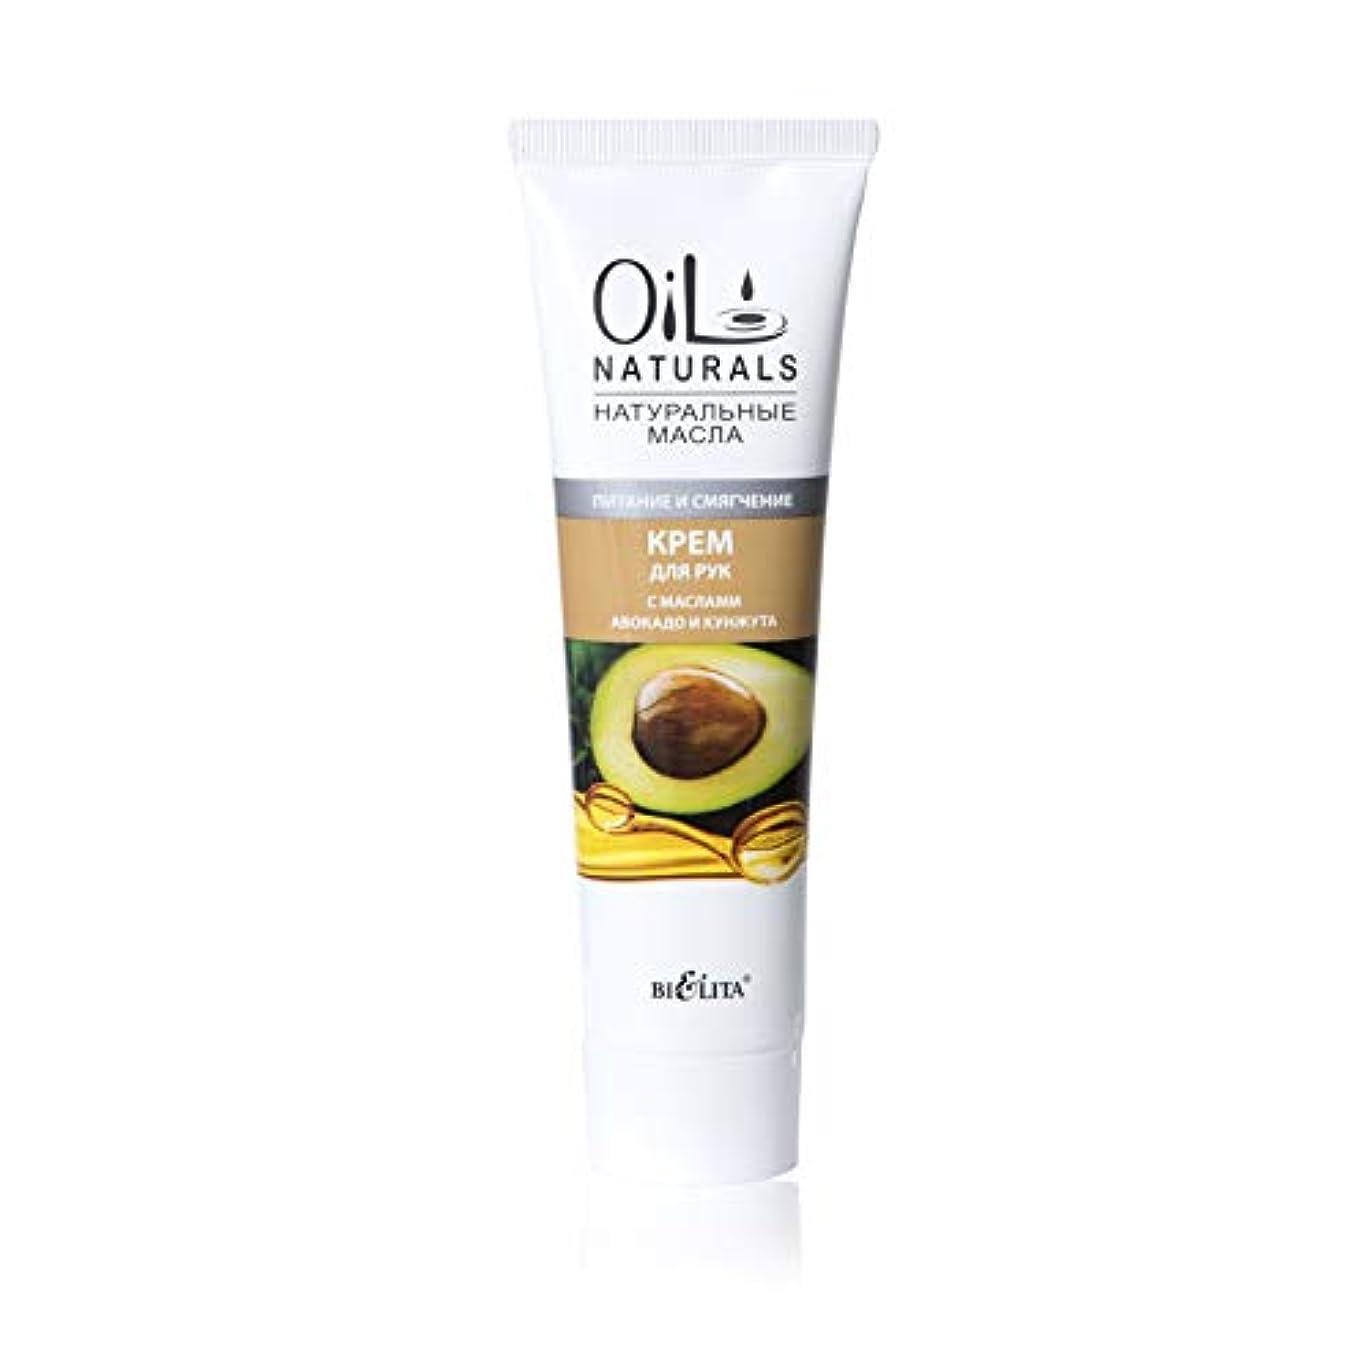 行商大使館科学Bielita & Vitex Oil Naturals Line | Nutrition & Softening Hand Cream, 100 ml | Avocado Oil, Silk Proteins, Sesame...